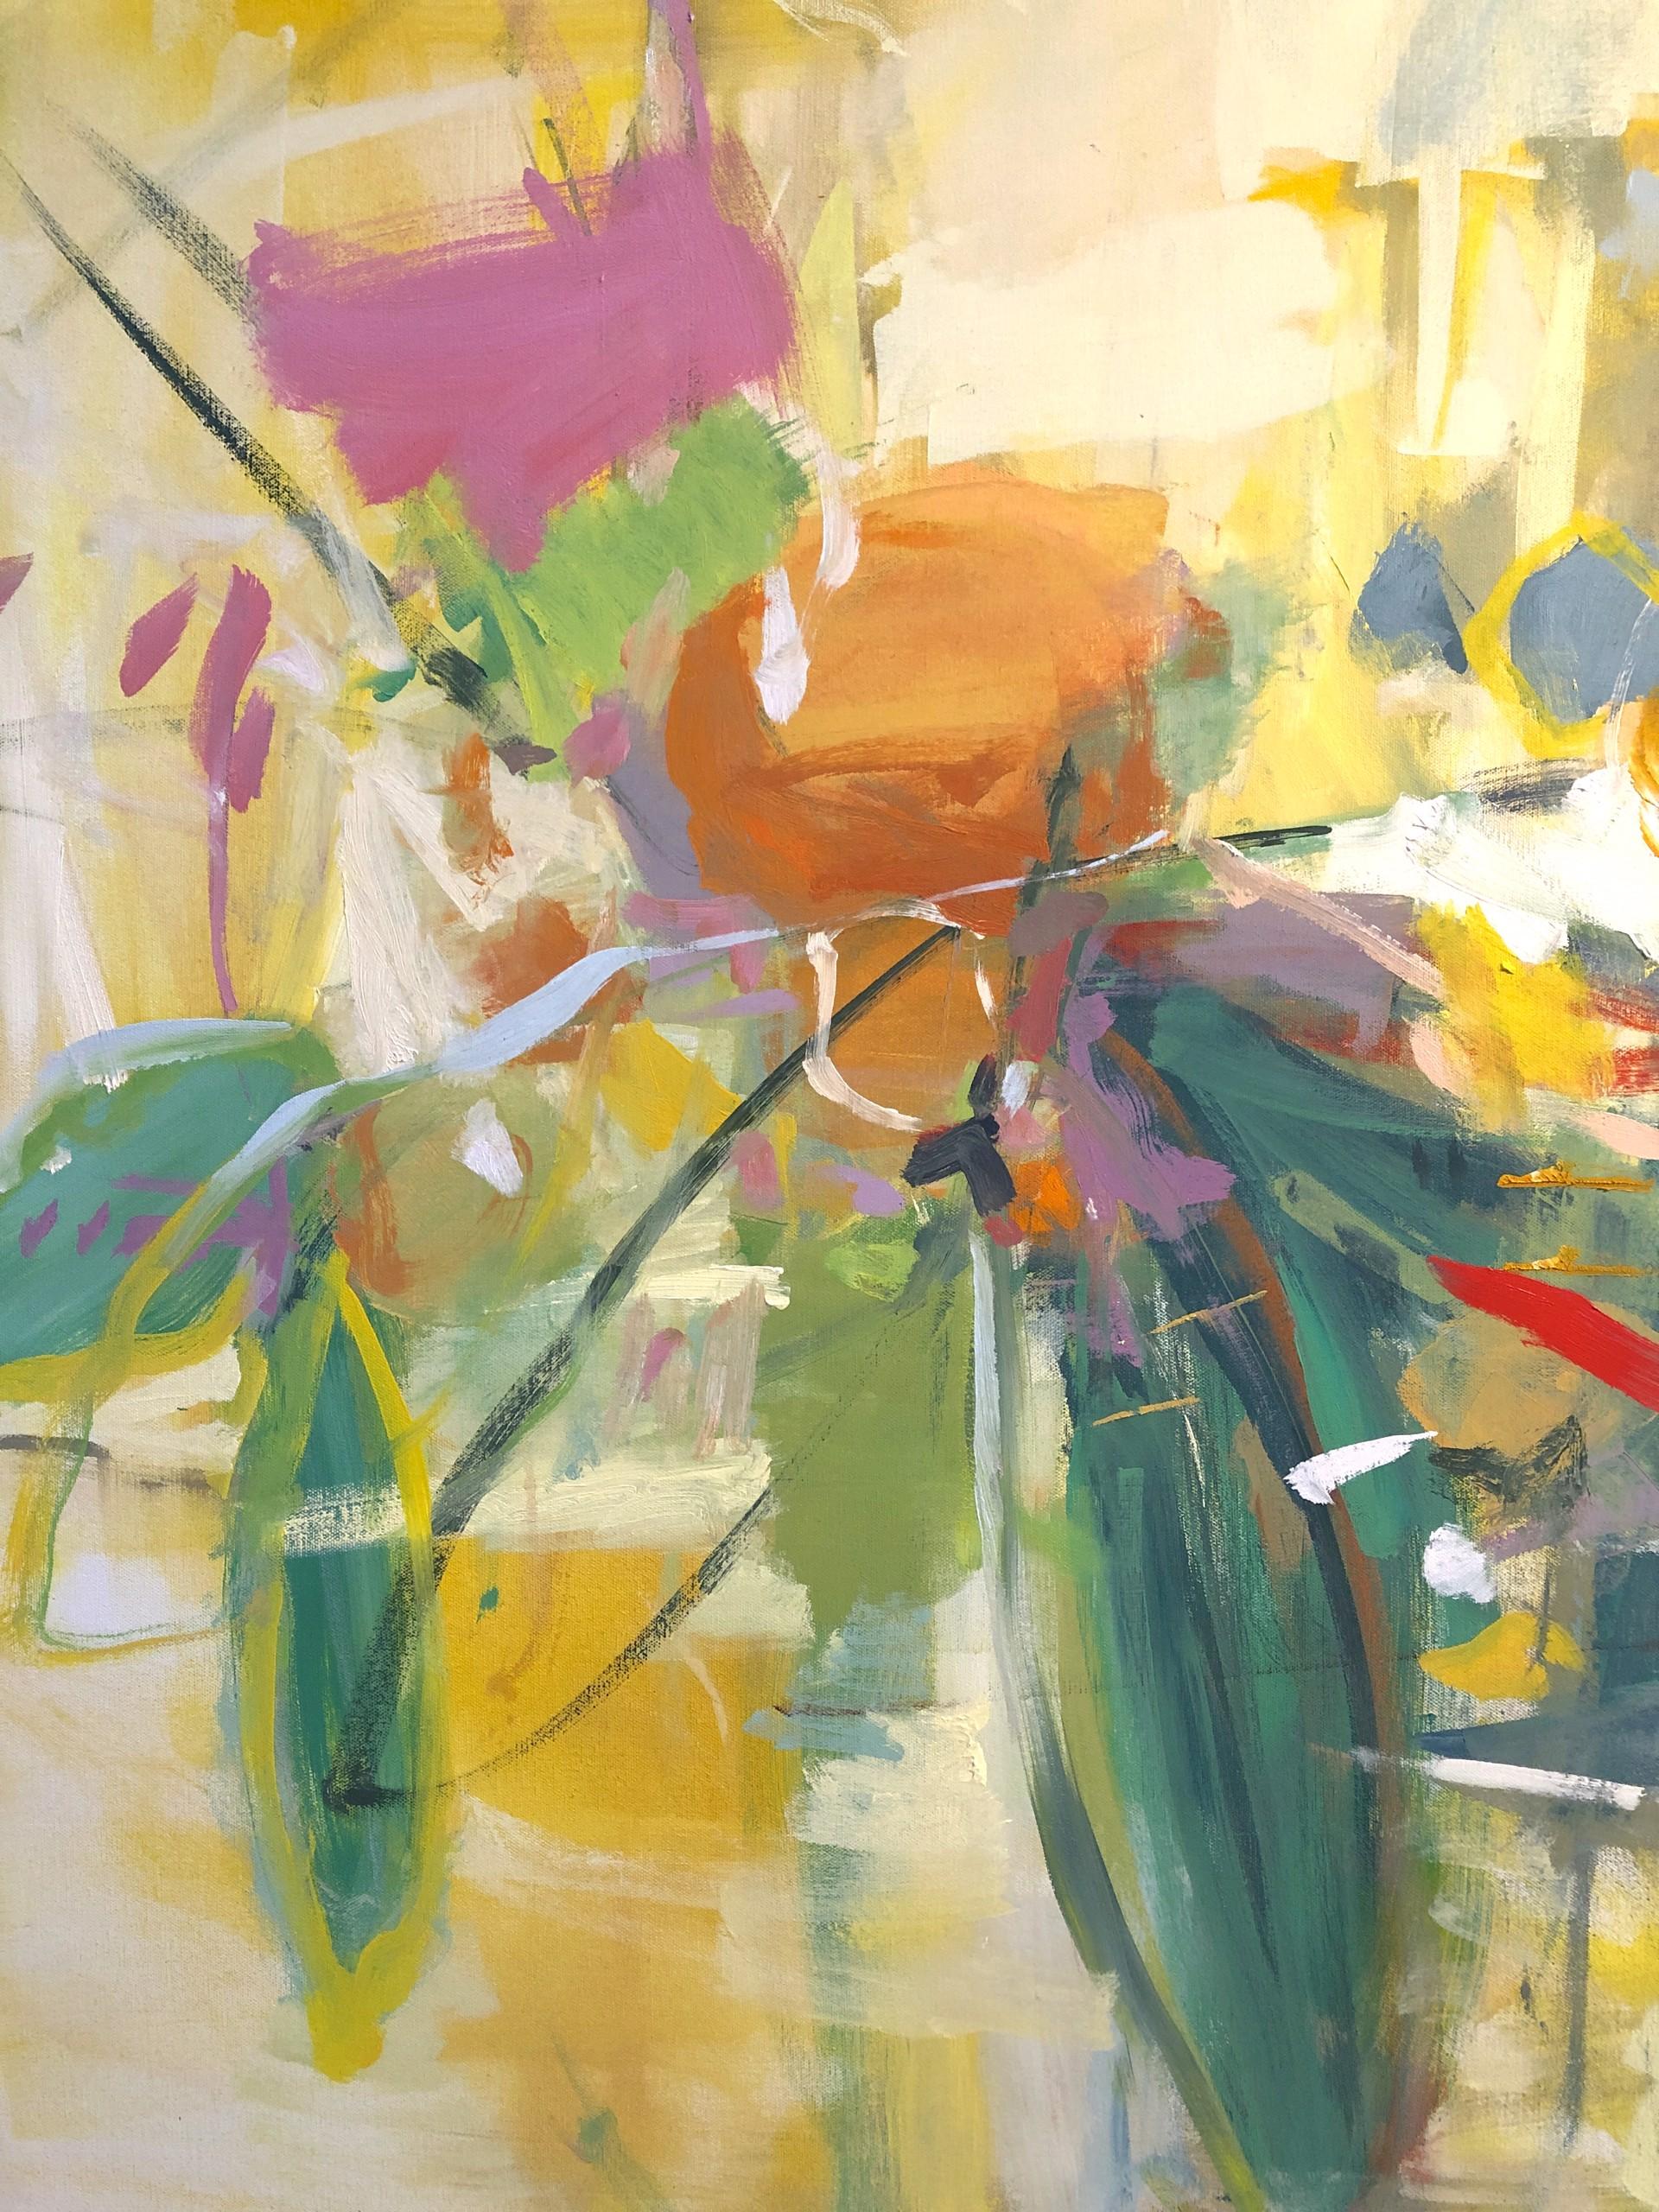 Juicy Fruit by Marissa Vogl